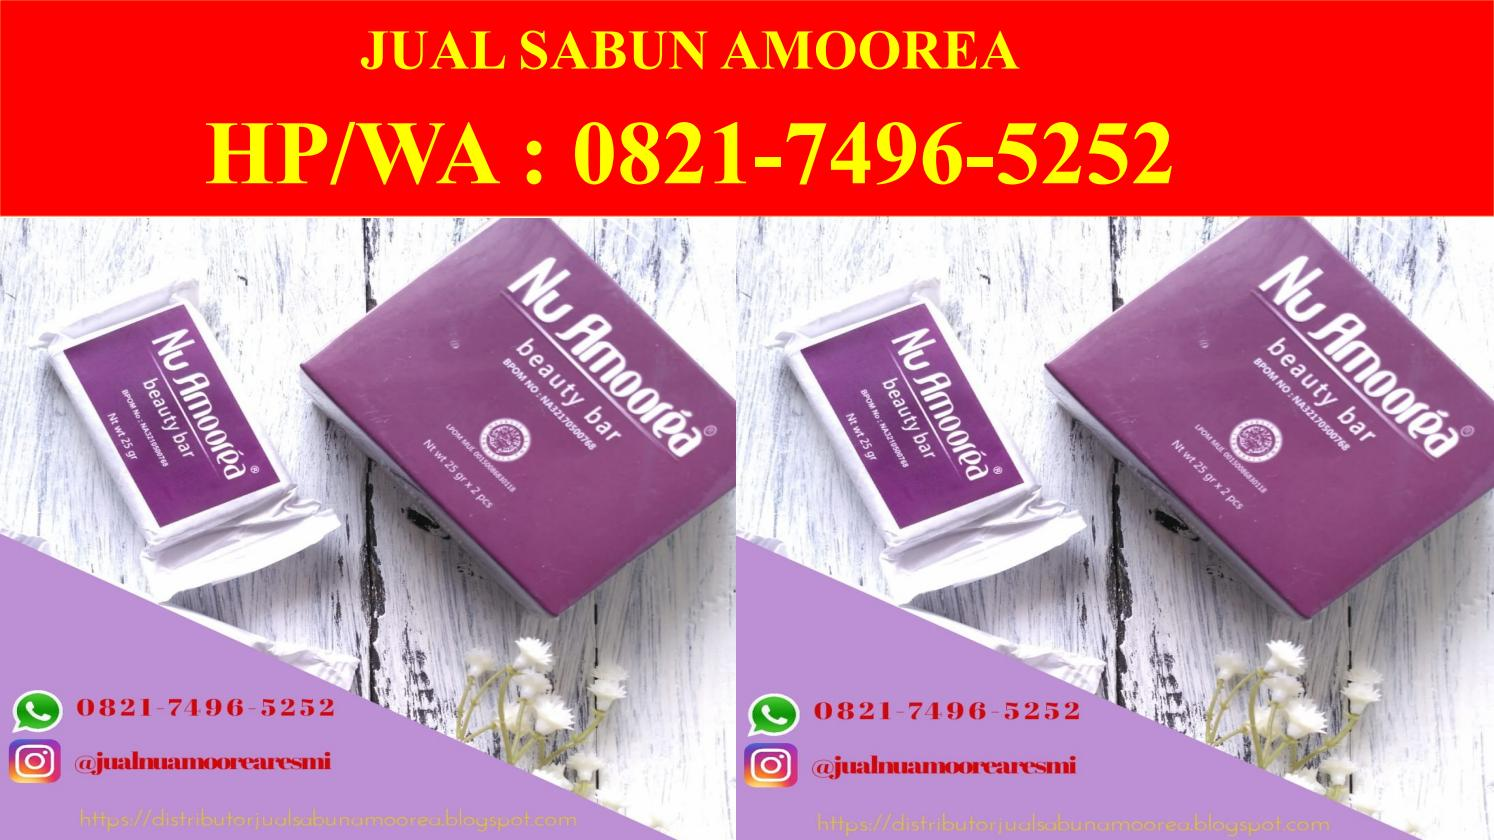 Stokis Amoorea Purwokerto 0821 7496 5252telp Wa By Agen Amoera Sabun Jual Issuu